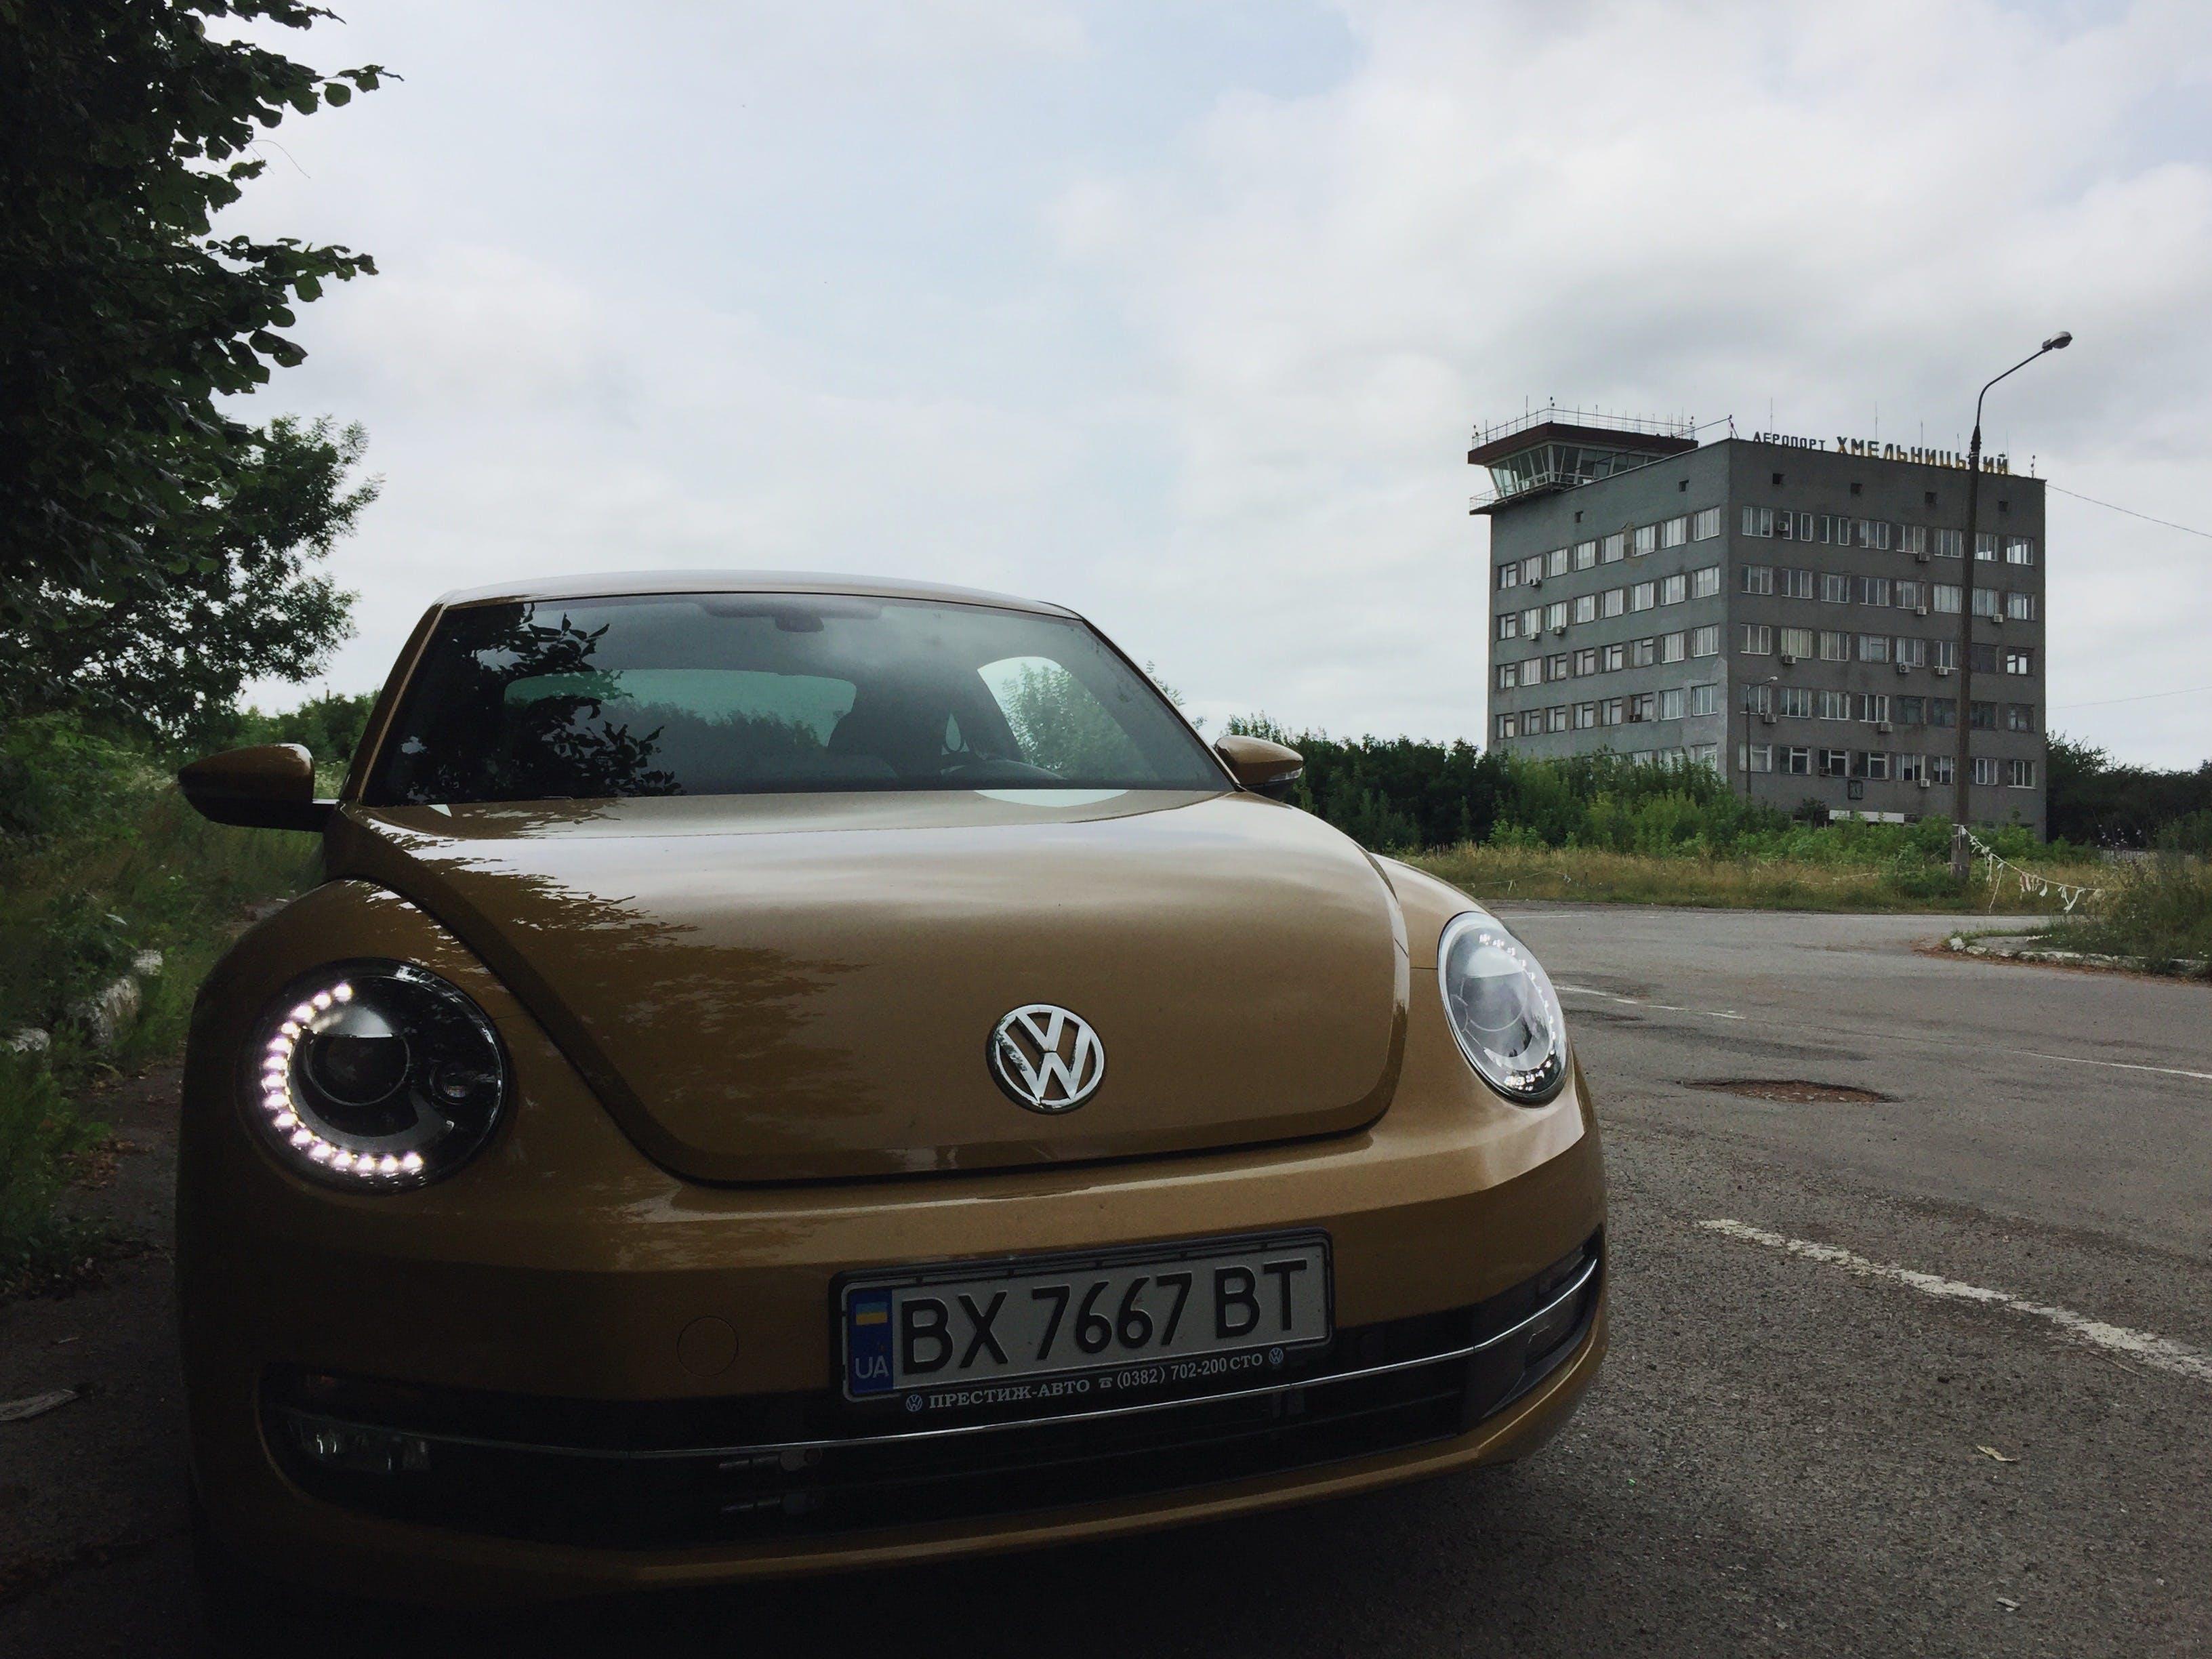 Free stock photo of beetle, car, volkswagen, vw